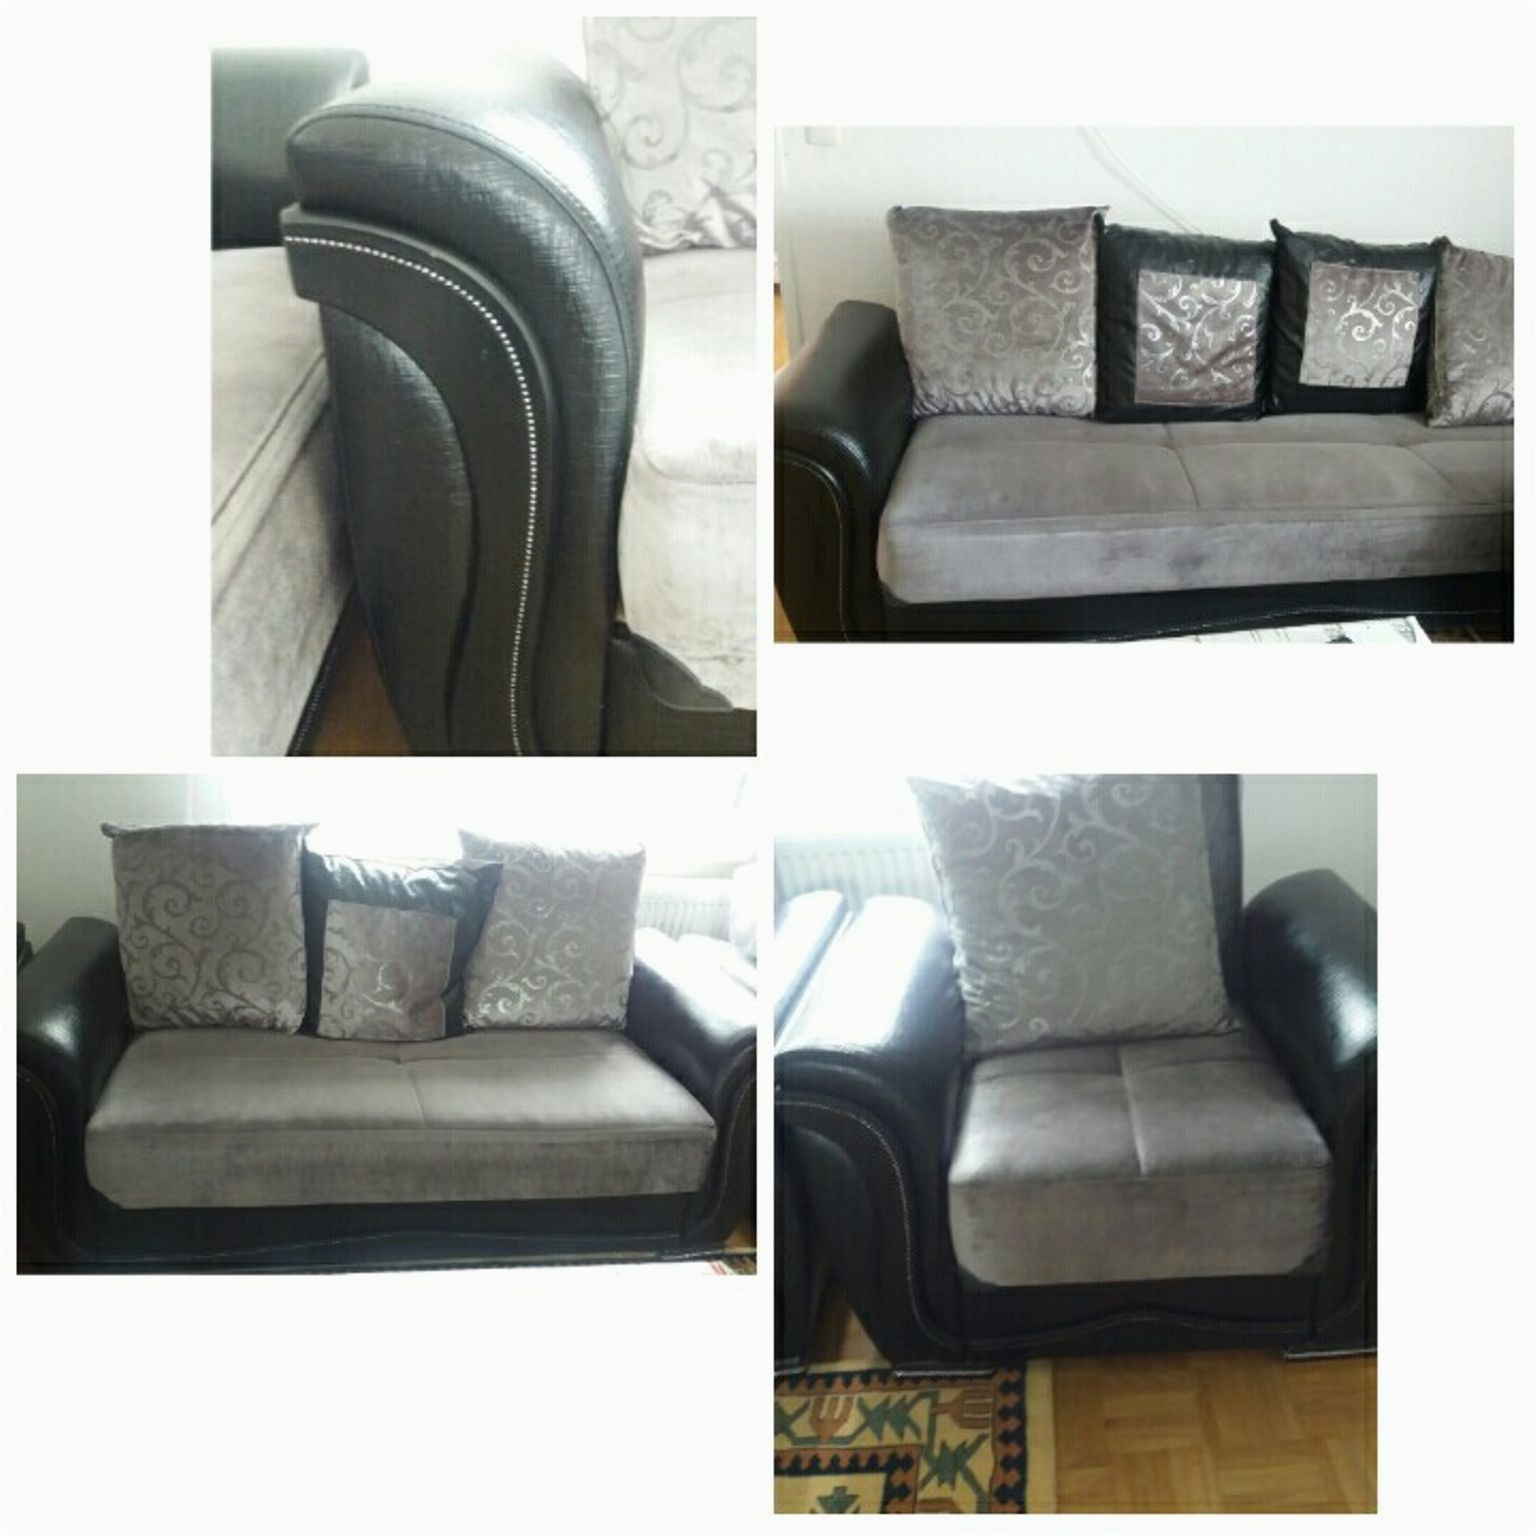 ikea stuehle sessel ikea esszimmer sofa reizend luft sofa ikea luxus bmw x3 2 0d konzept elegant